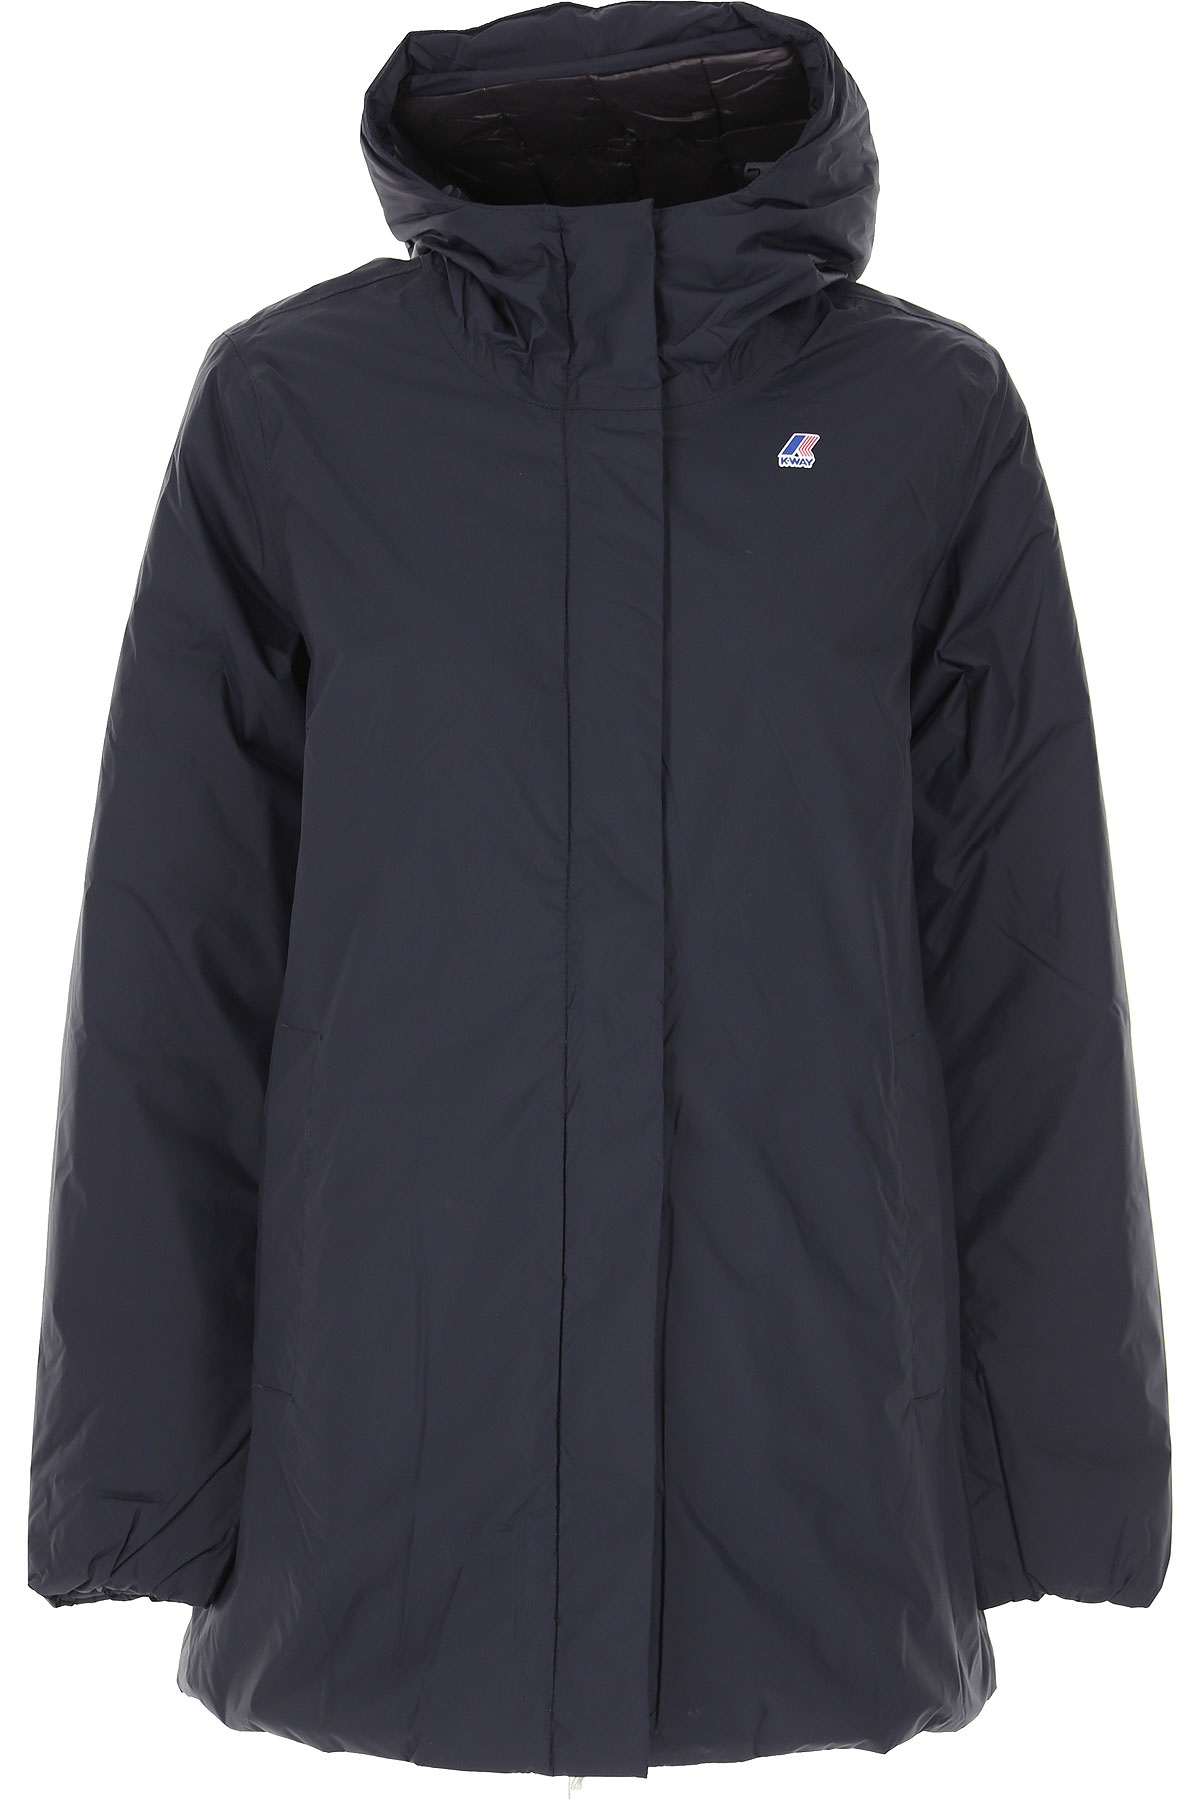 K-Way Down Jacket for Women, Puffer Ski Jacket On Sale, Ink Blue, polyamide, 2019, 44 46